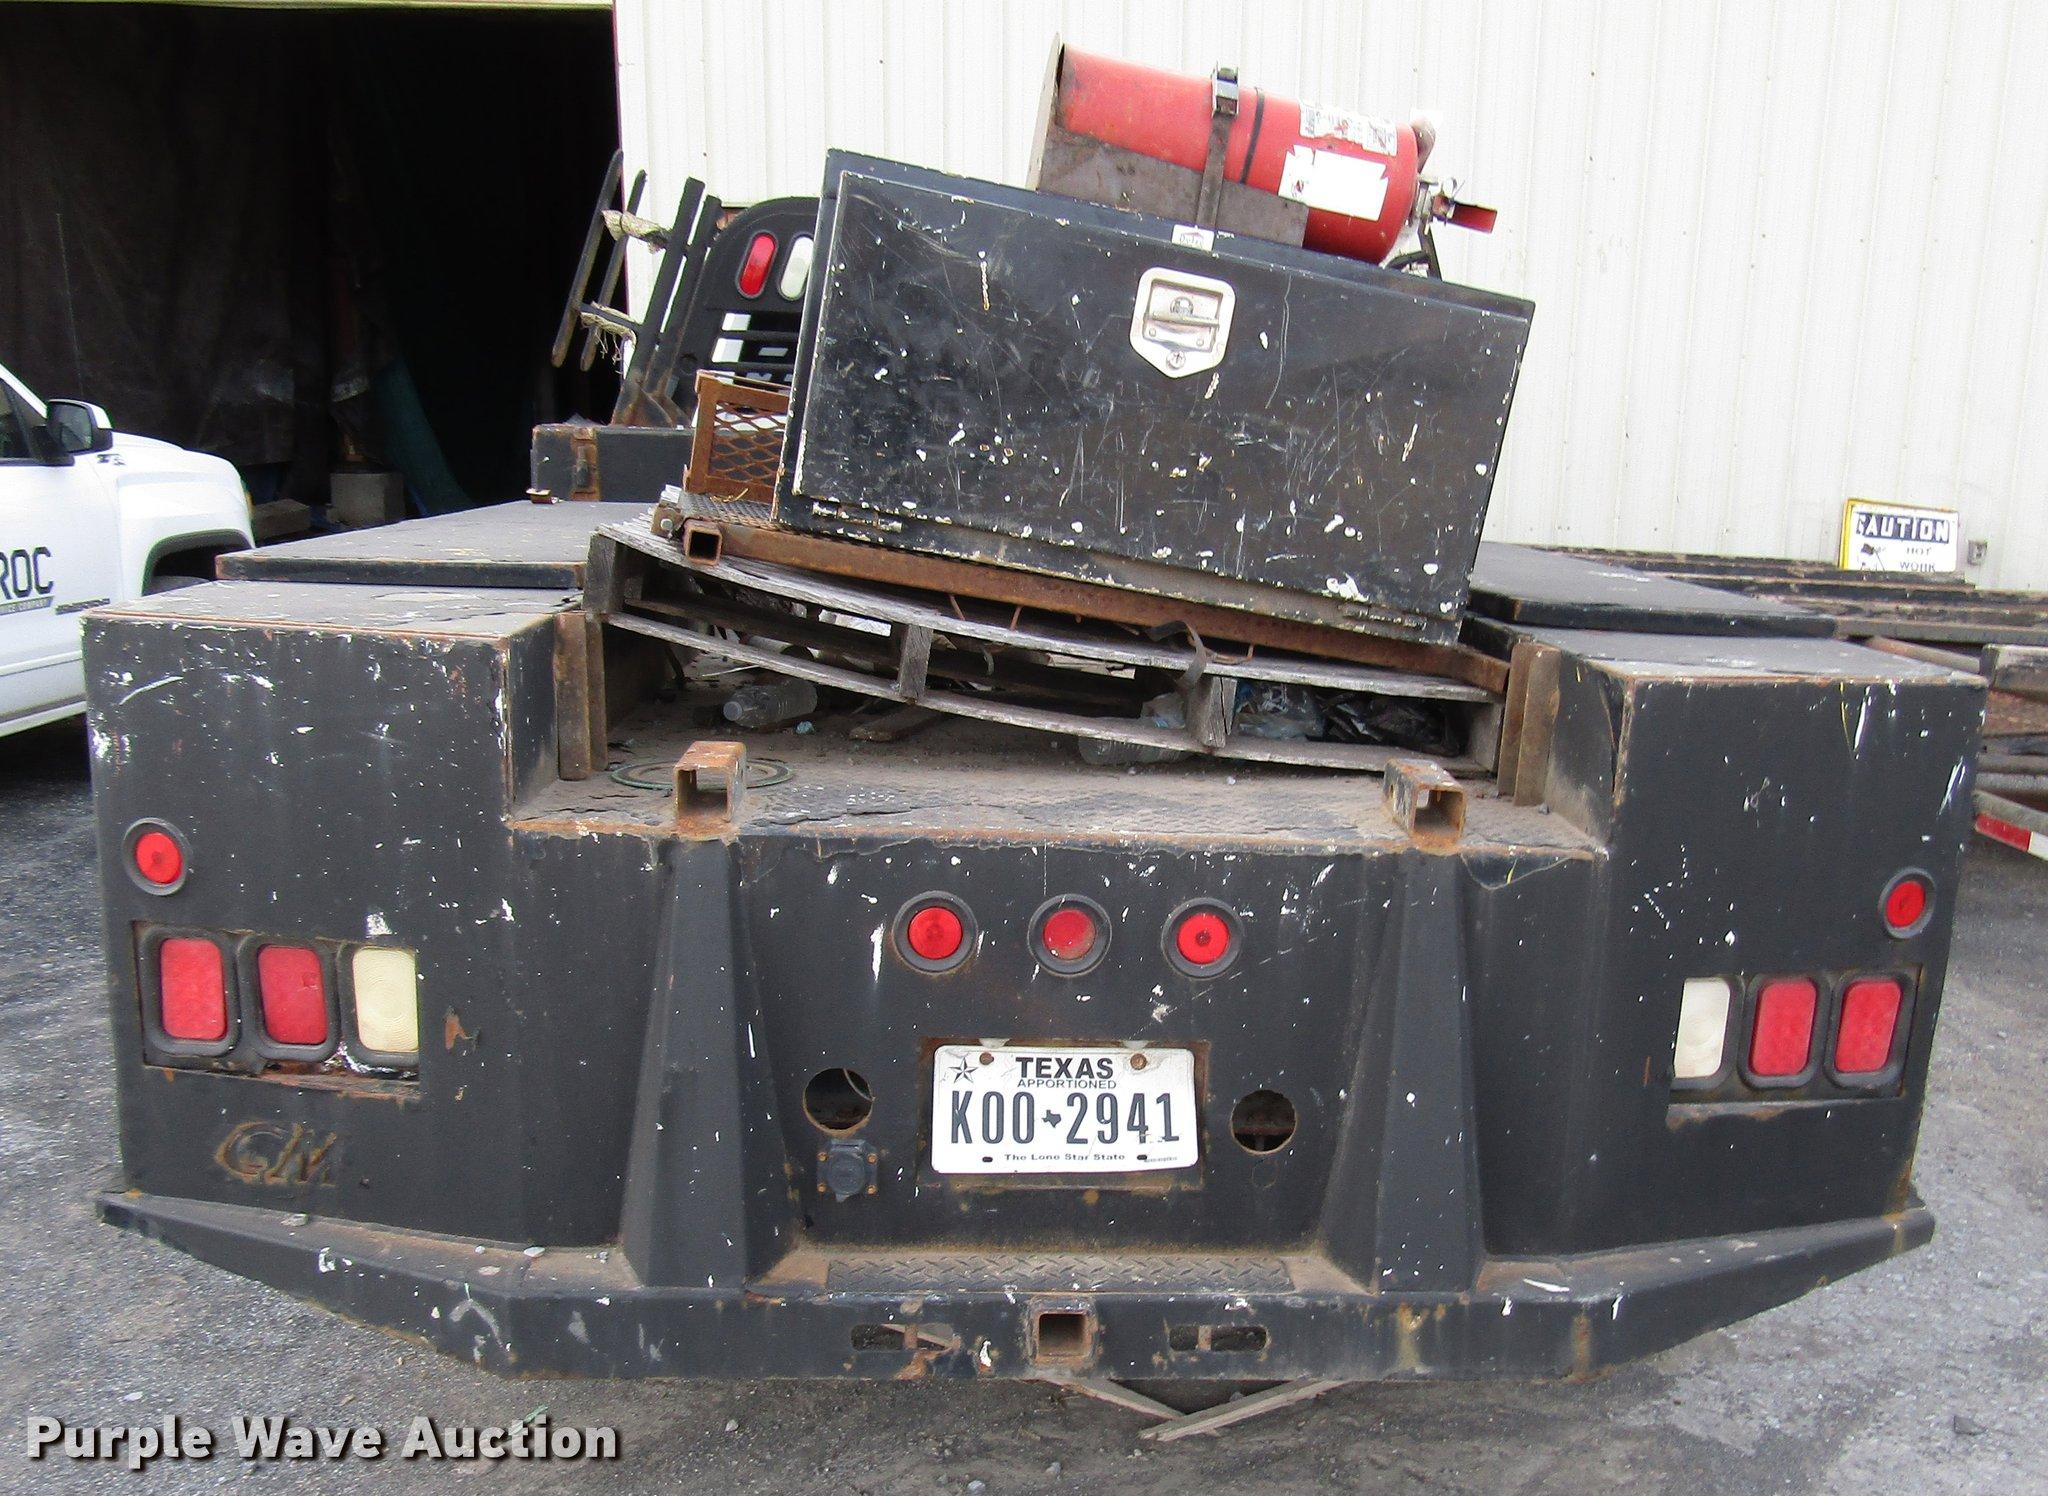 2012 Dodge Ram 5500 flatbed truck | Item DB6947 | Wednesday